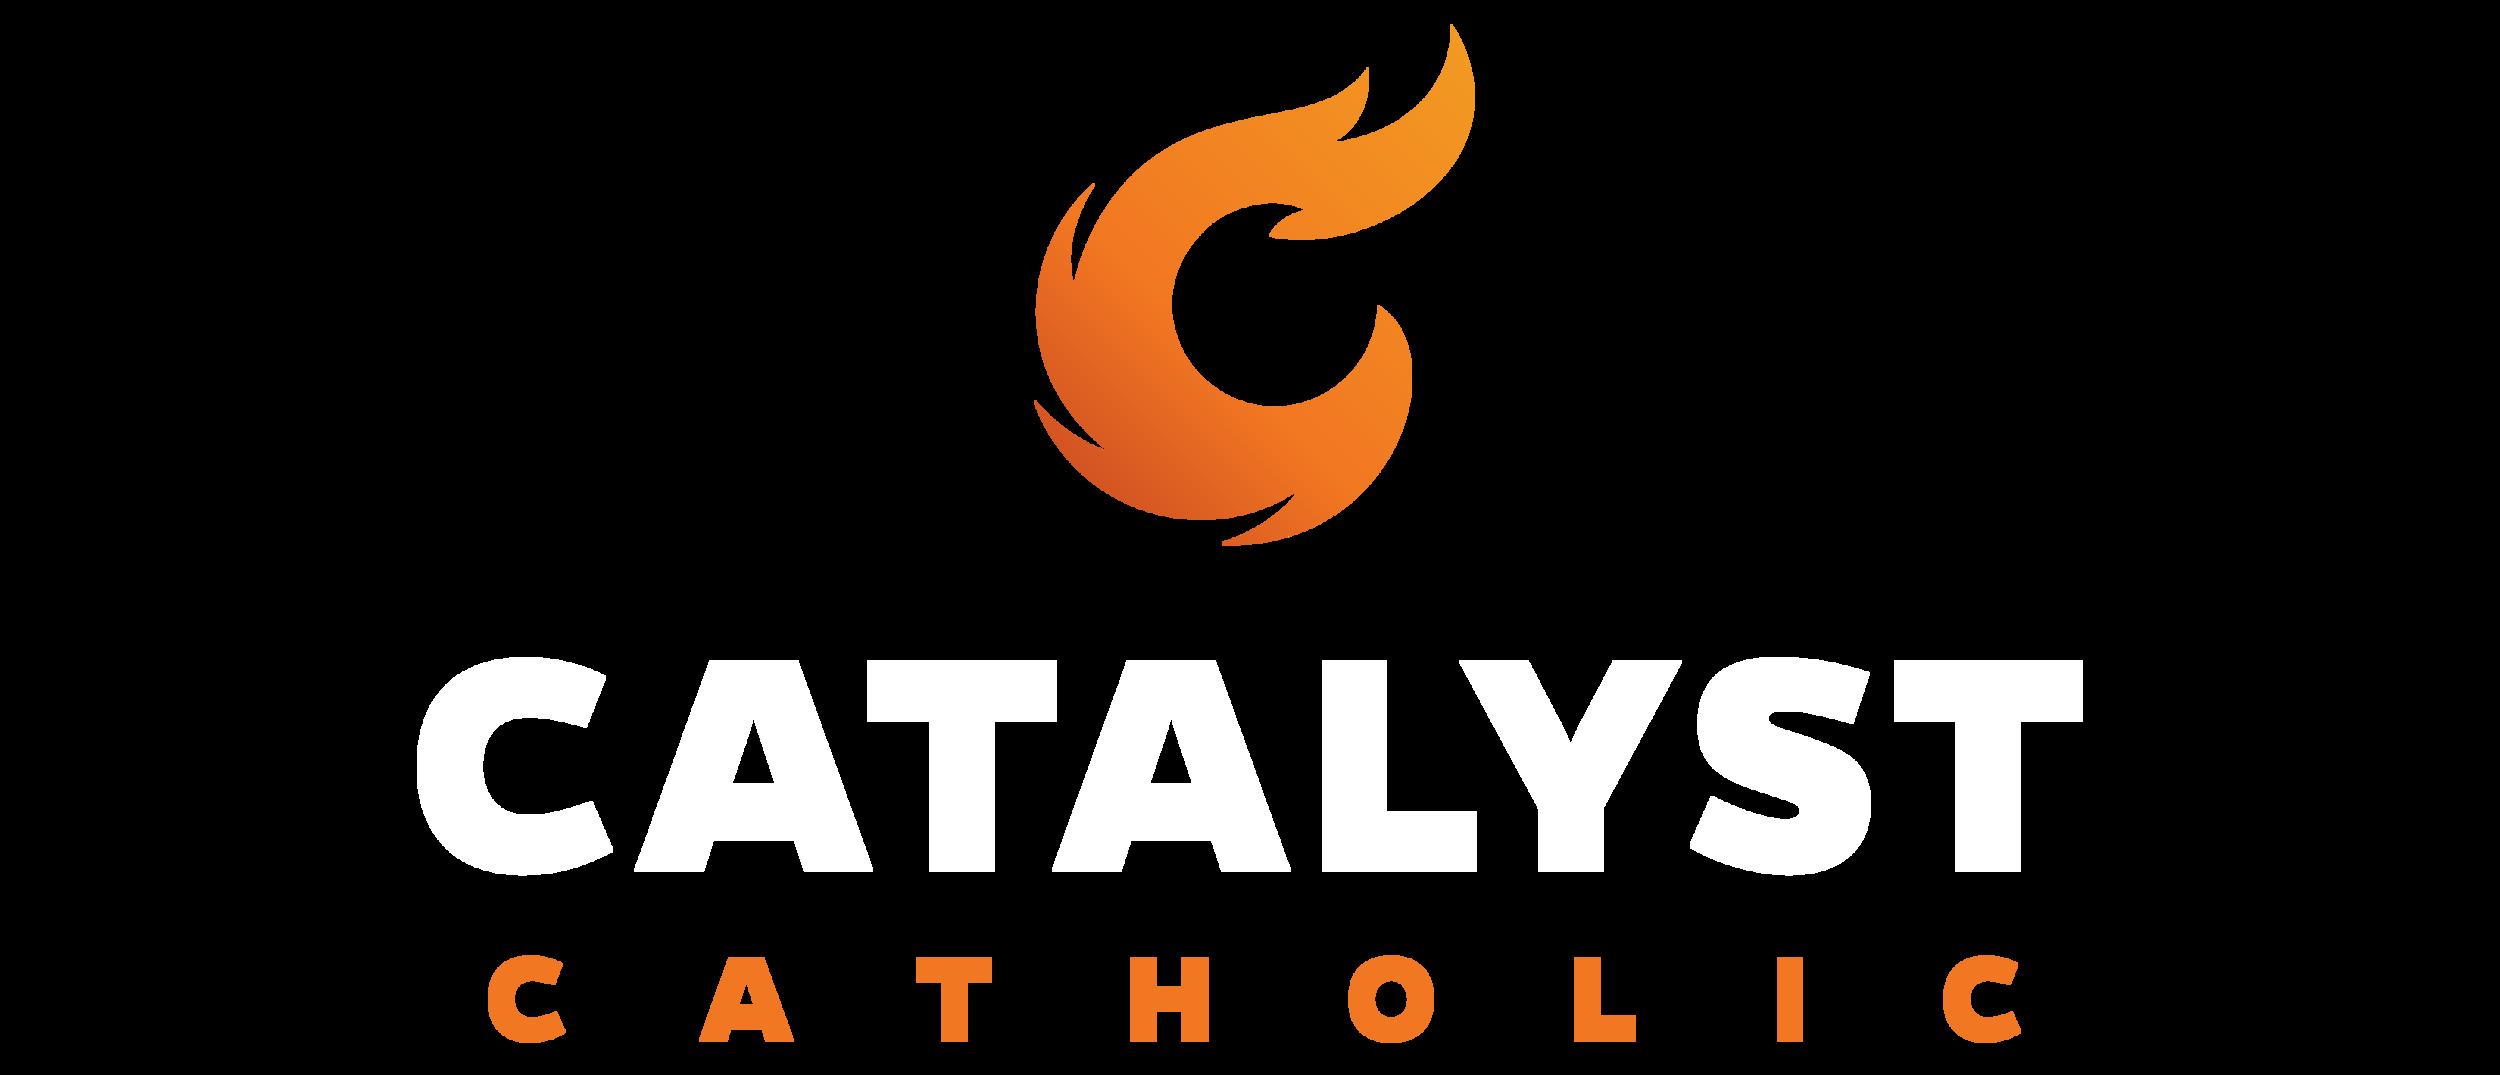 CatalystCatholicLogo-cropped-02.png